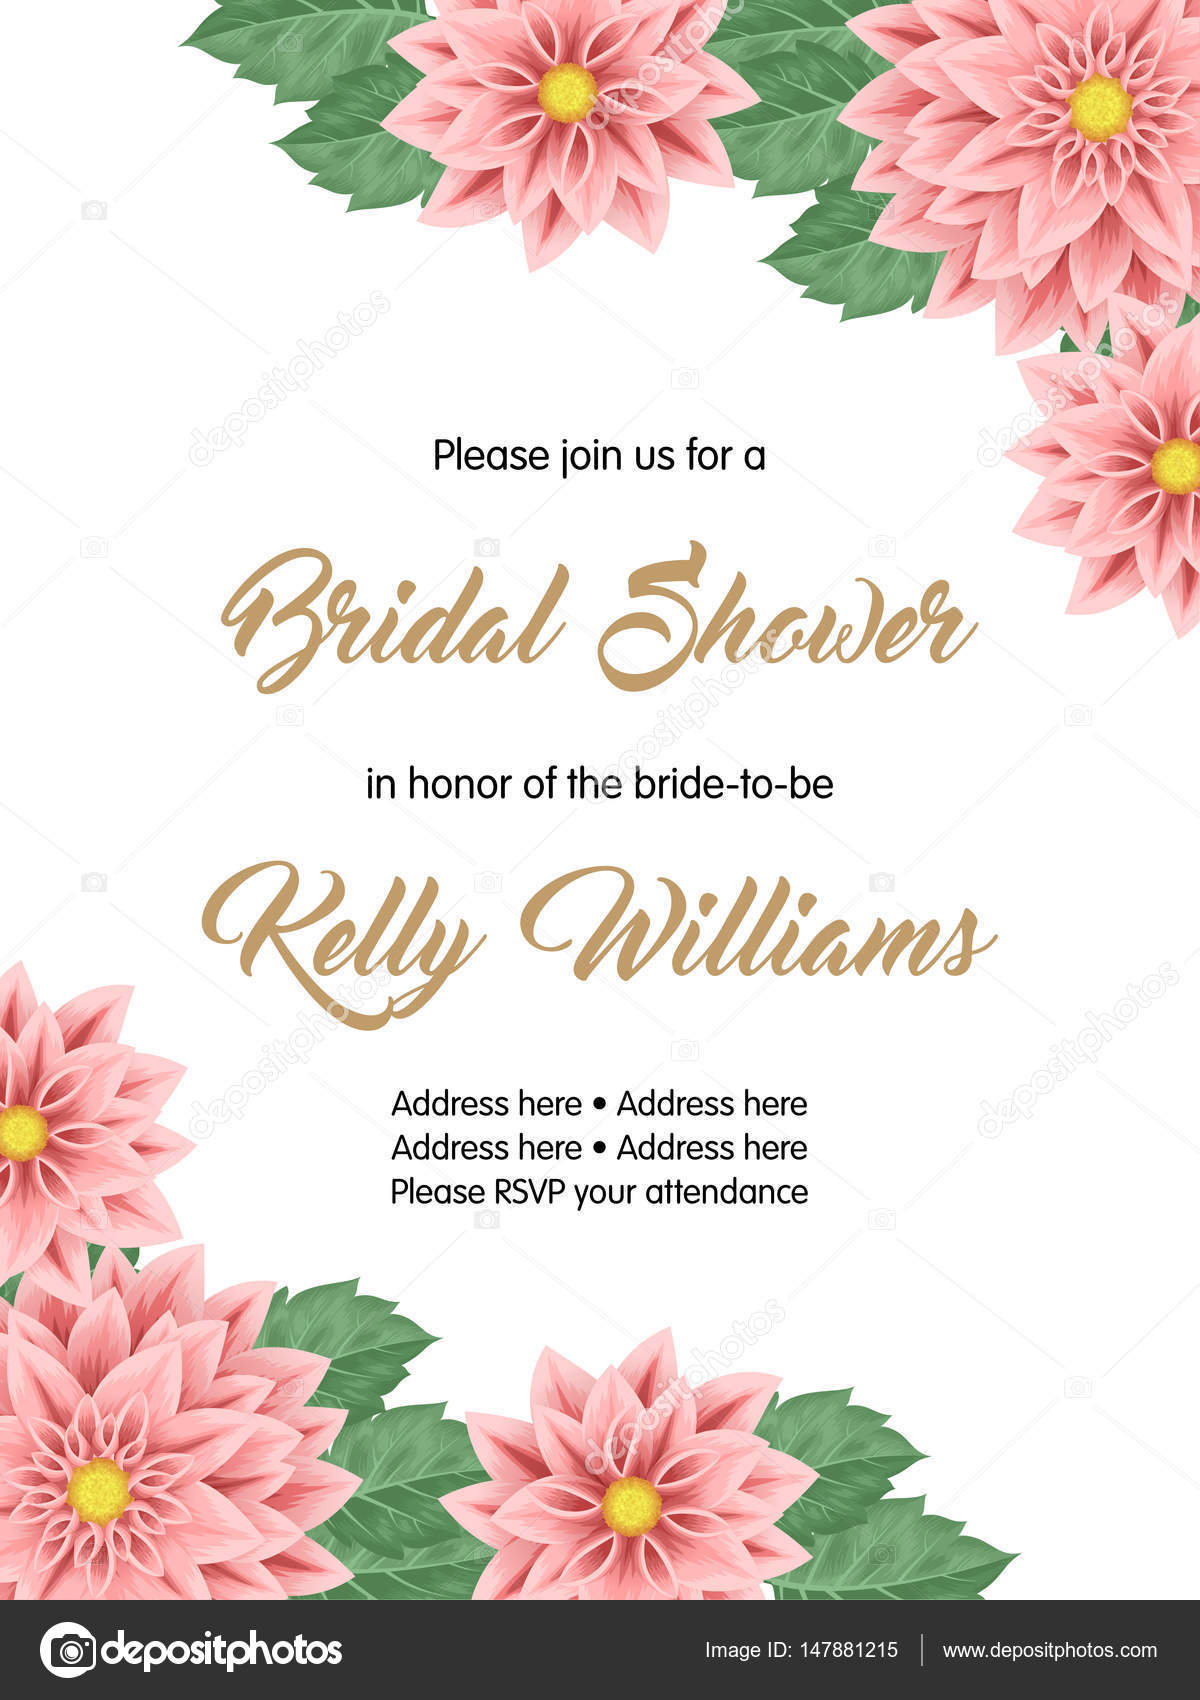 Bridal shower invitation template \u2014 Stock Vector © NonikaStar #147881215 - bridal shower invitation templates